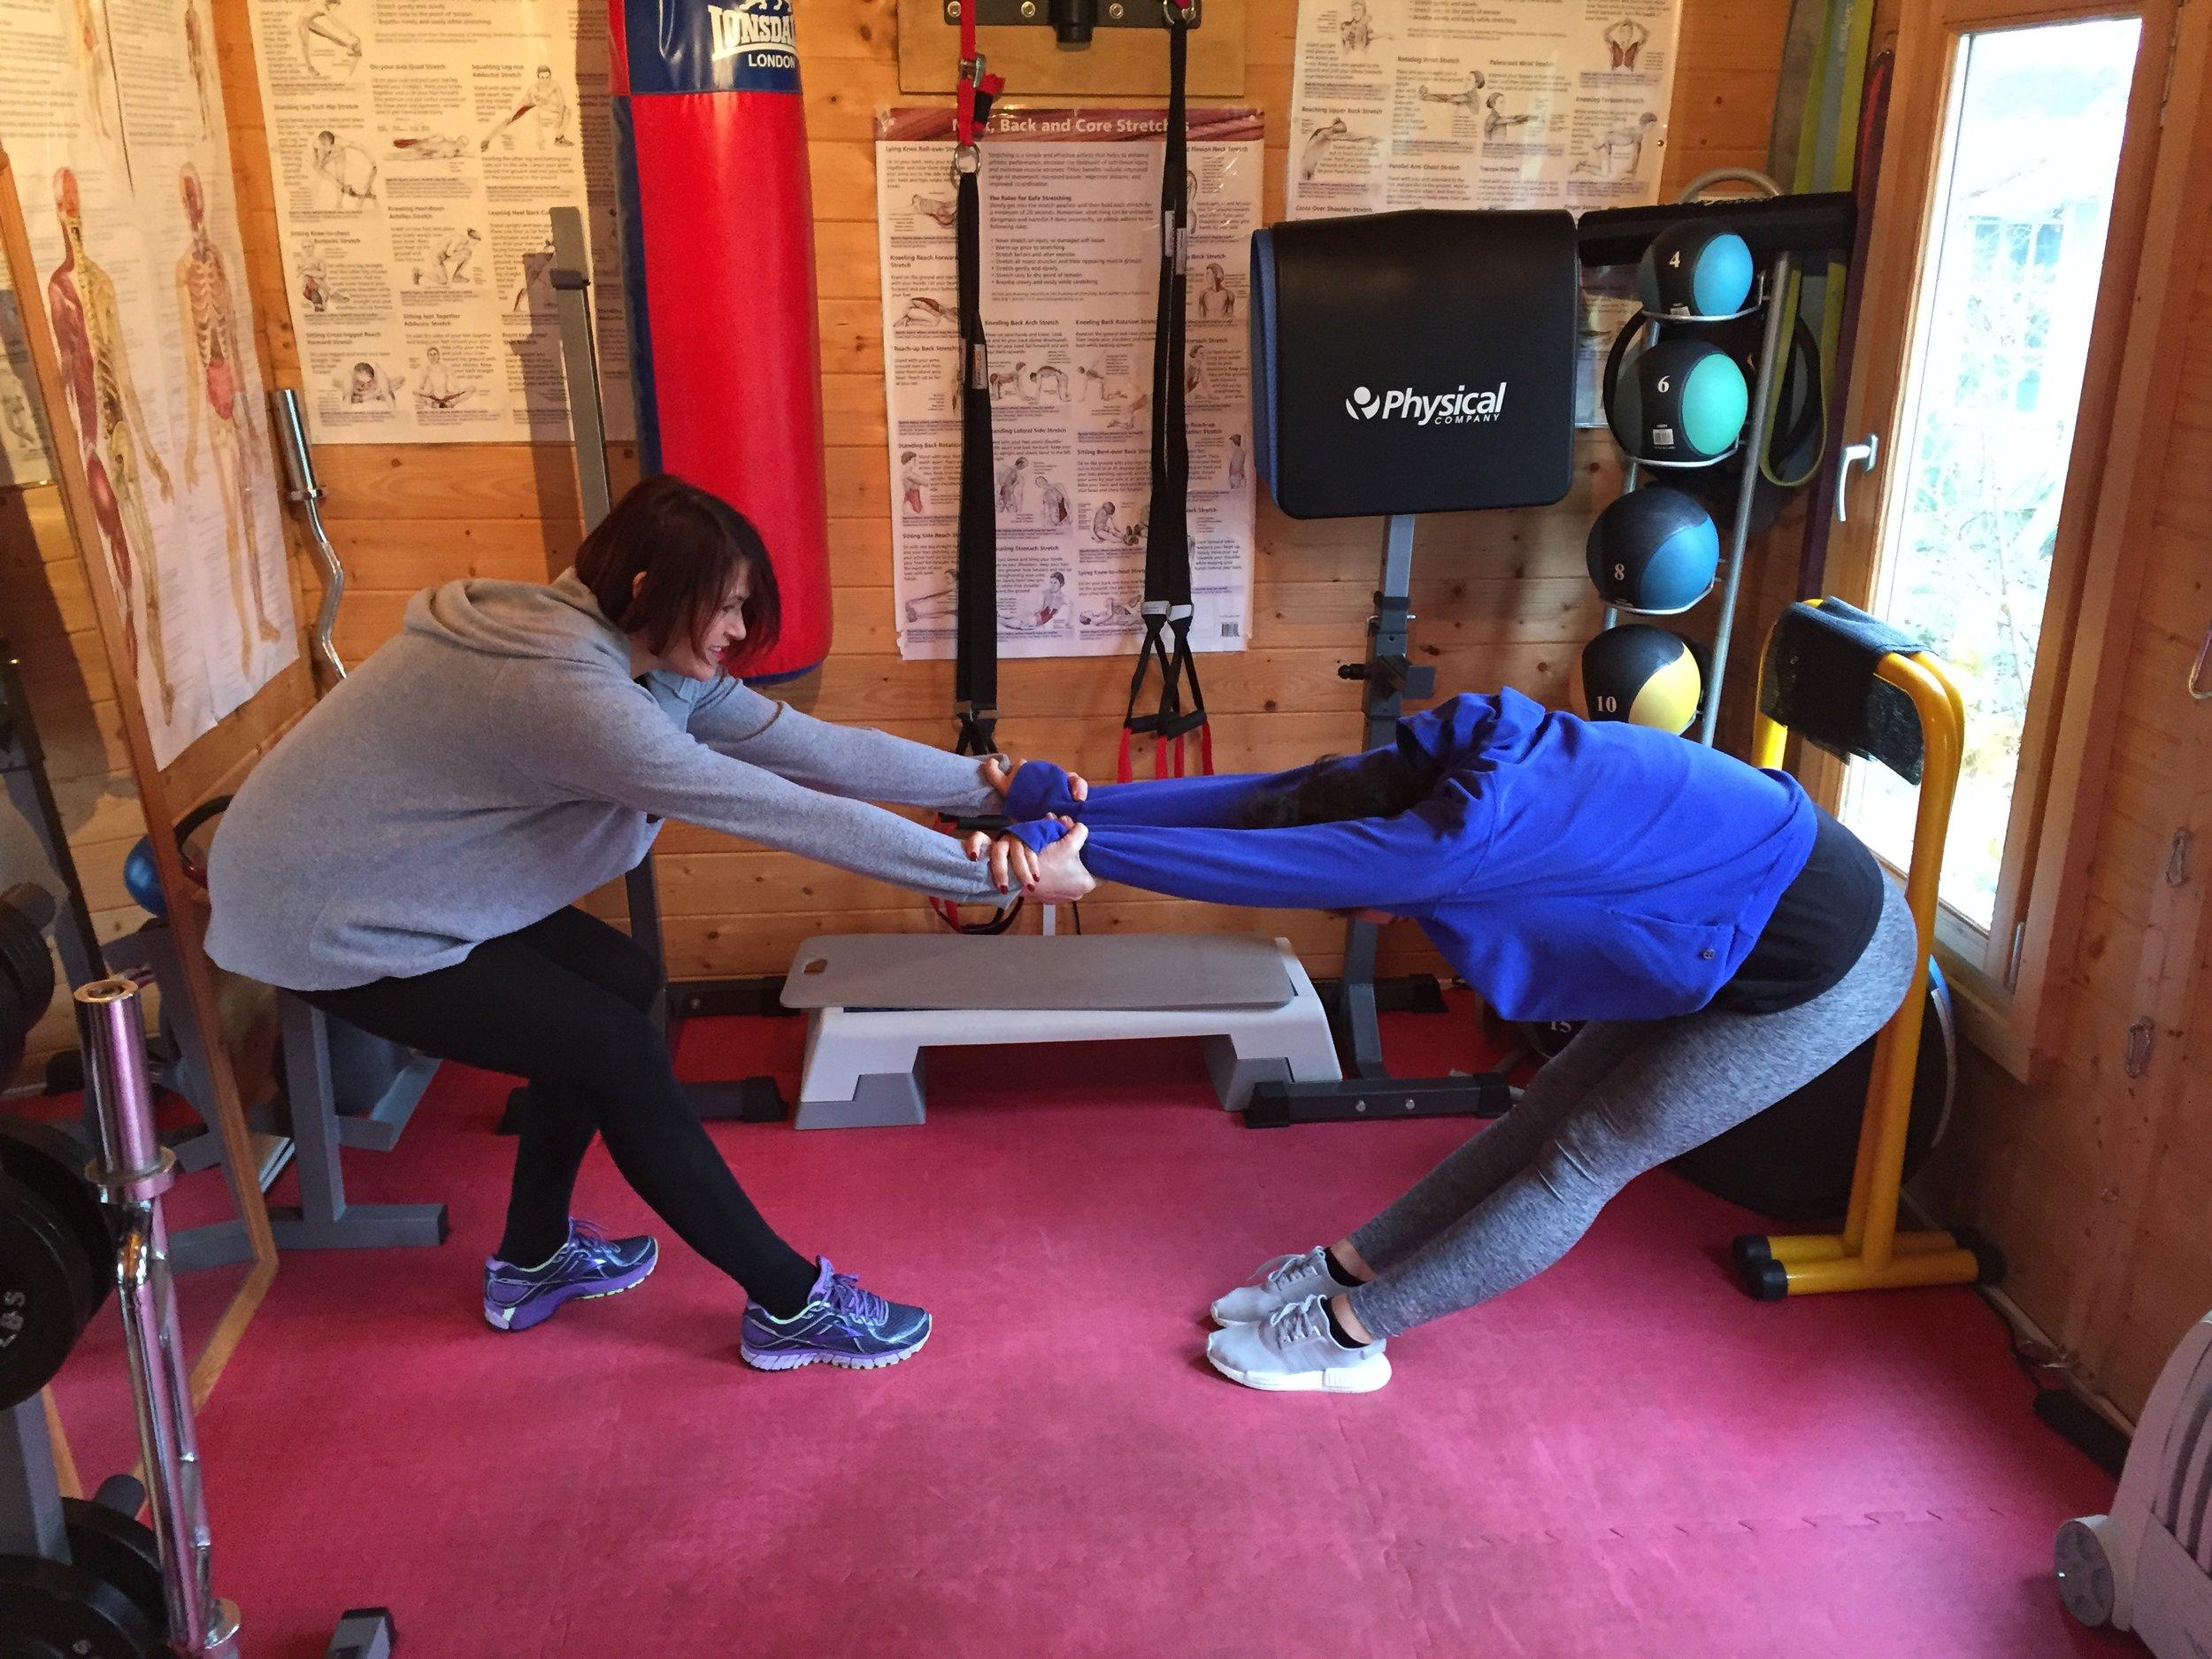 Personal Trainer Woking Stretching1.jpg